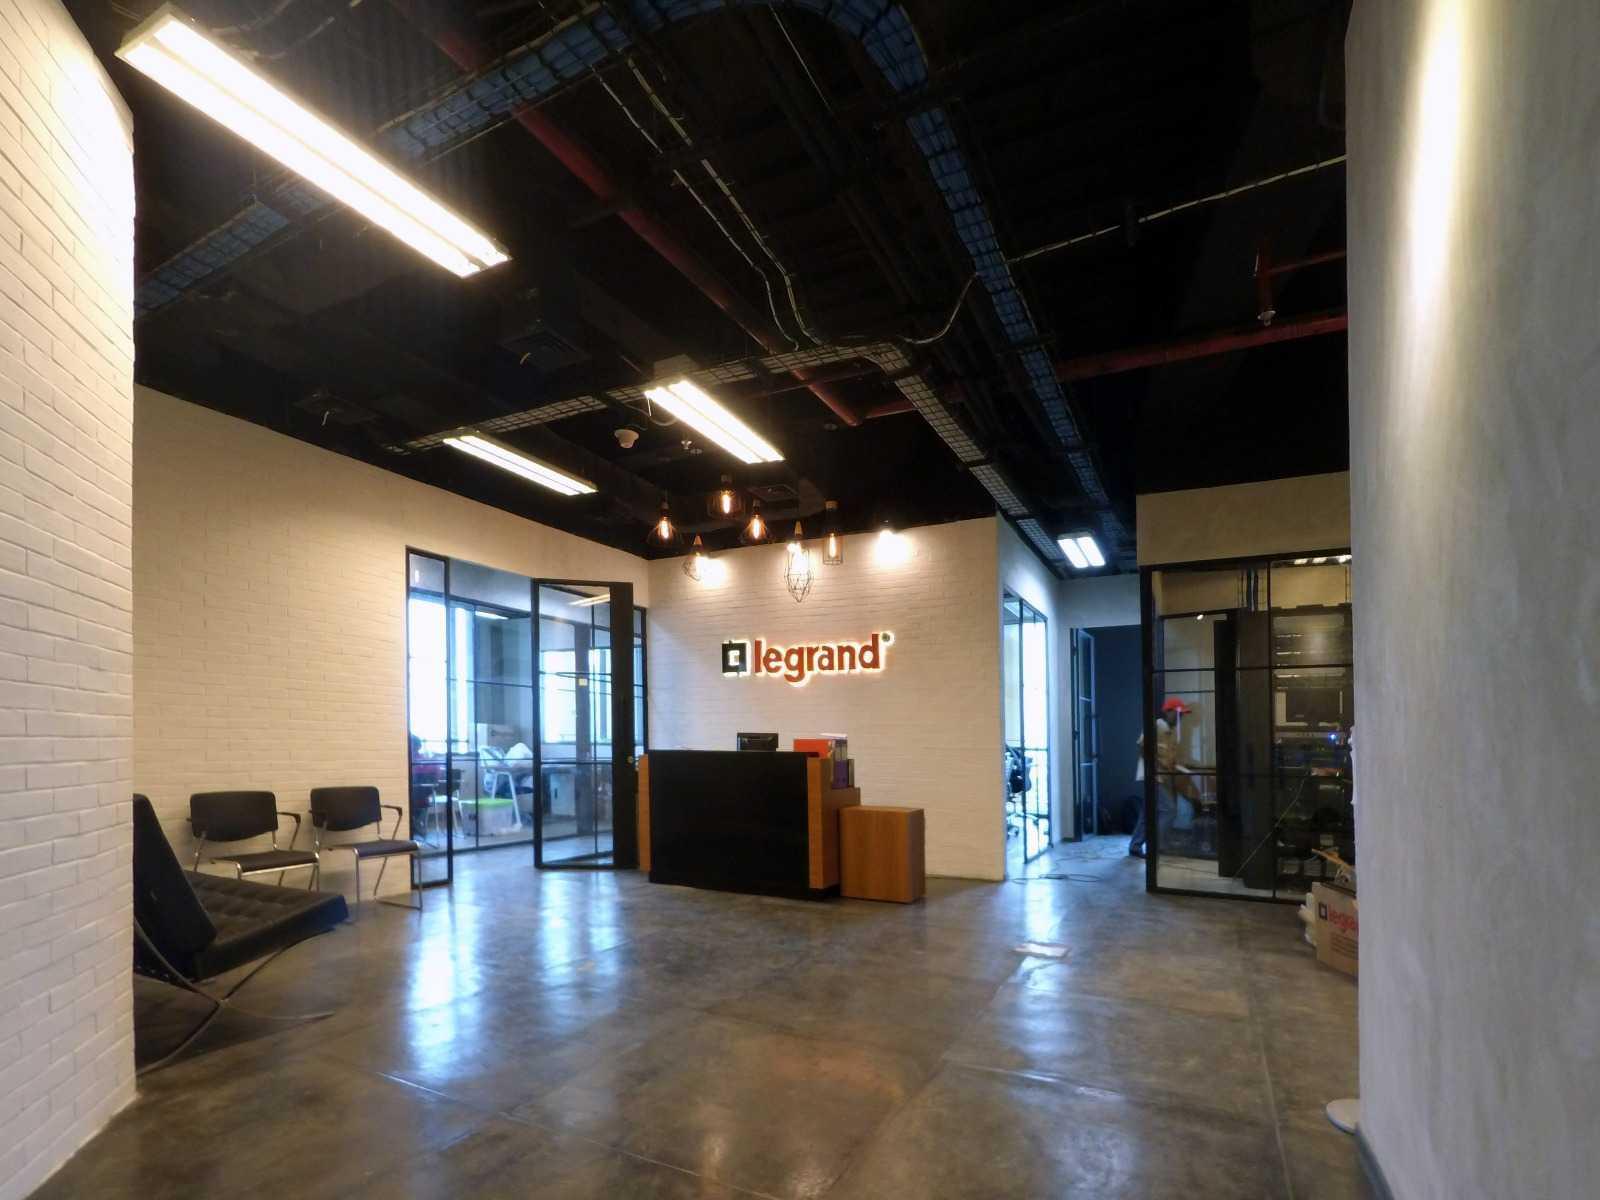 Arkadia Works Legrand Head Office Renovation Generali Tower 15Th Floor Generali Tower 15Th Floor Lobby Area Industrial  14376